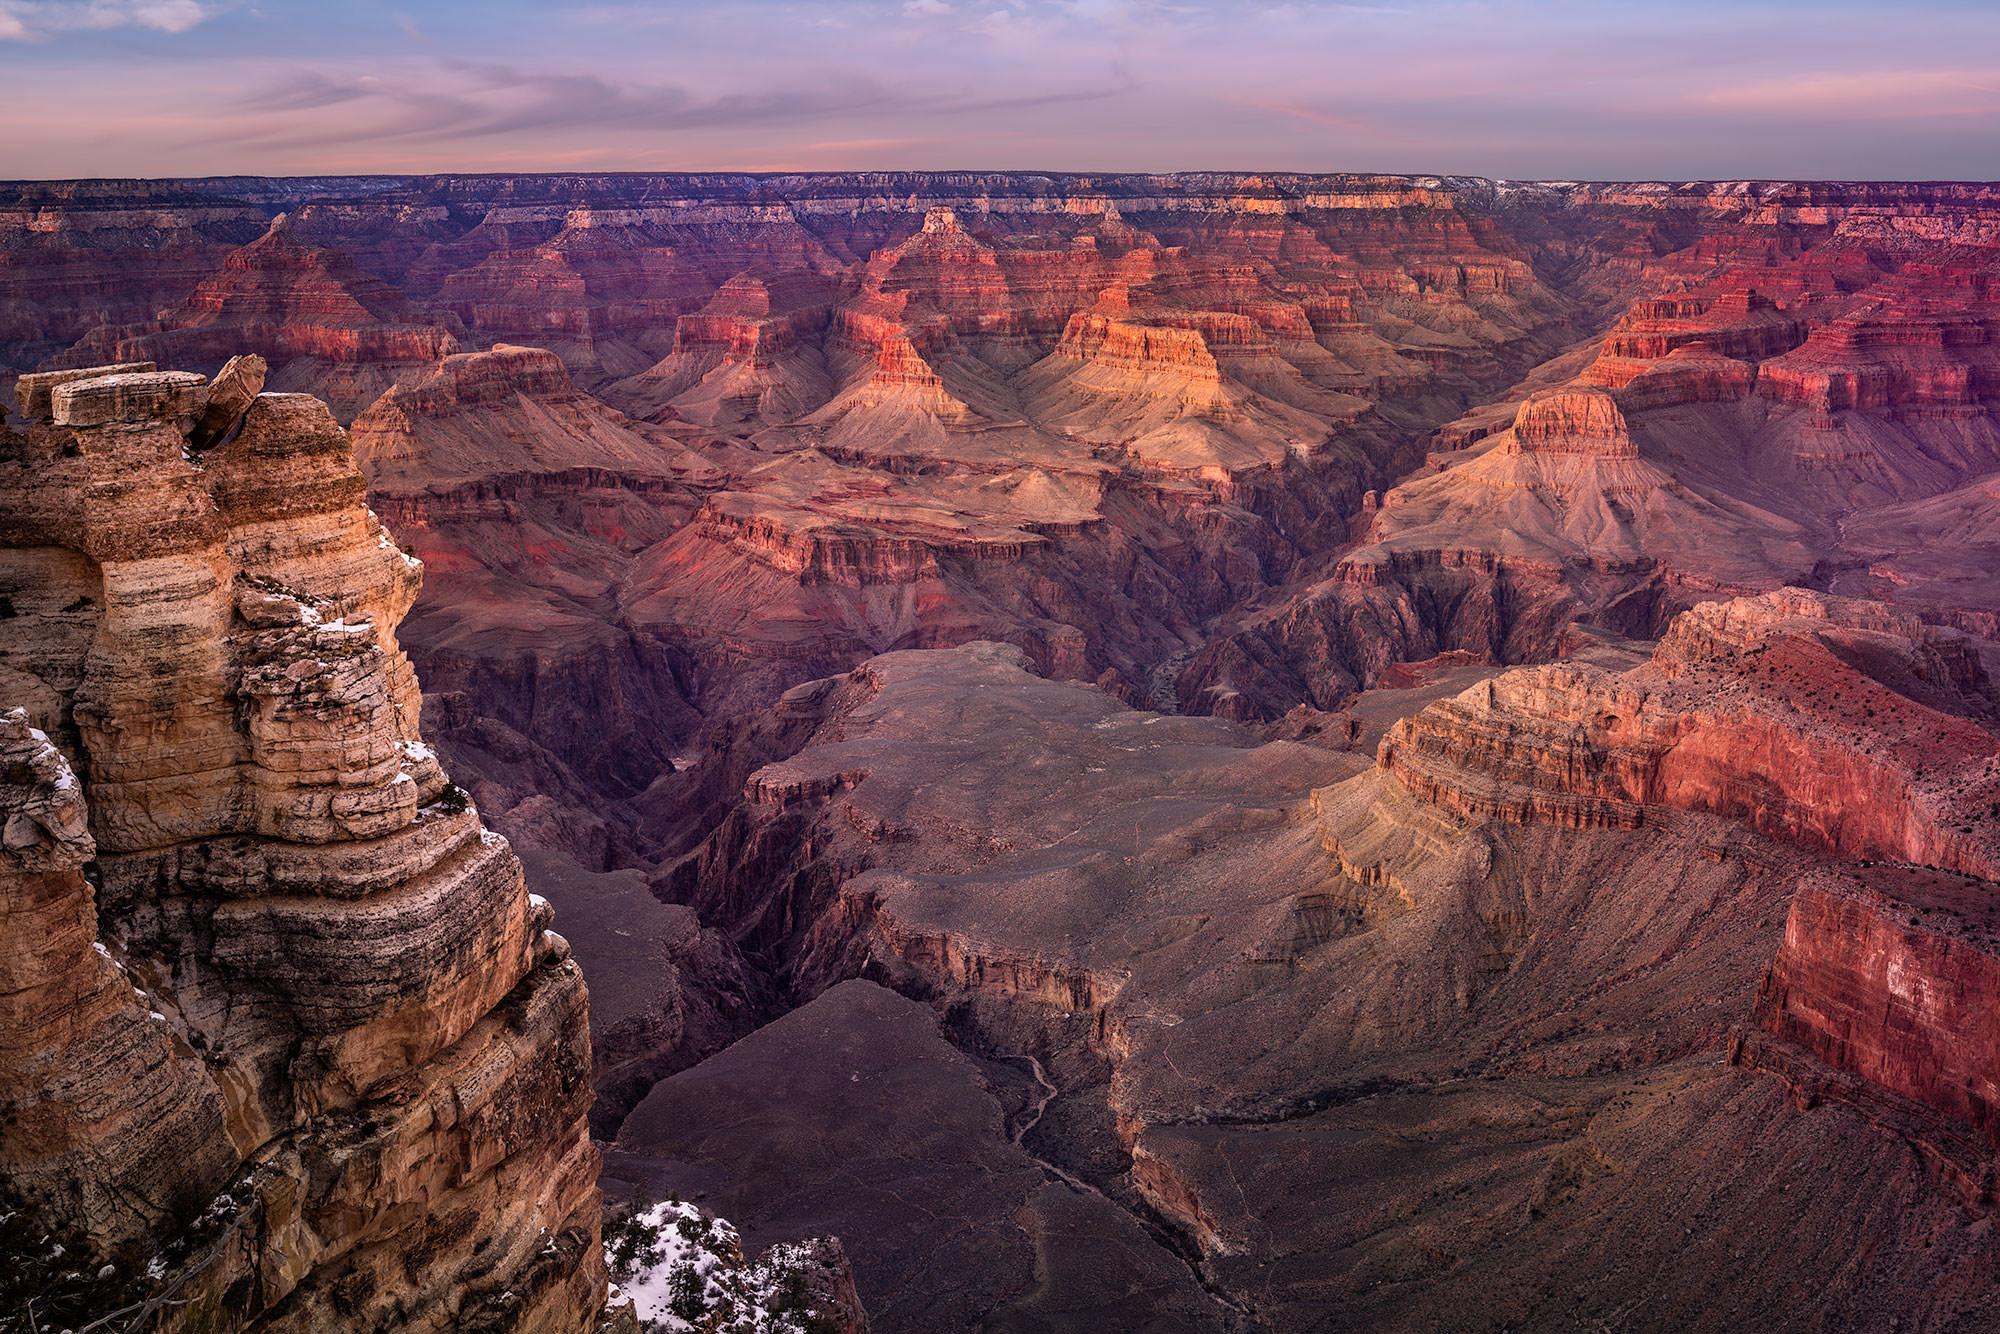 TWILIGHT NEAR MATHER POINT - South Rim - Grand Canyon, AZ